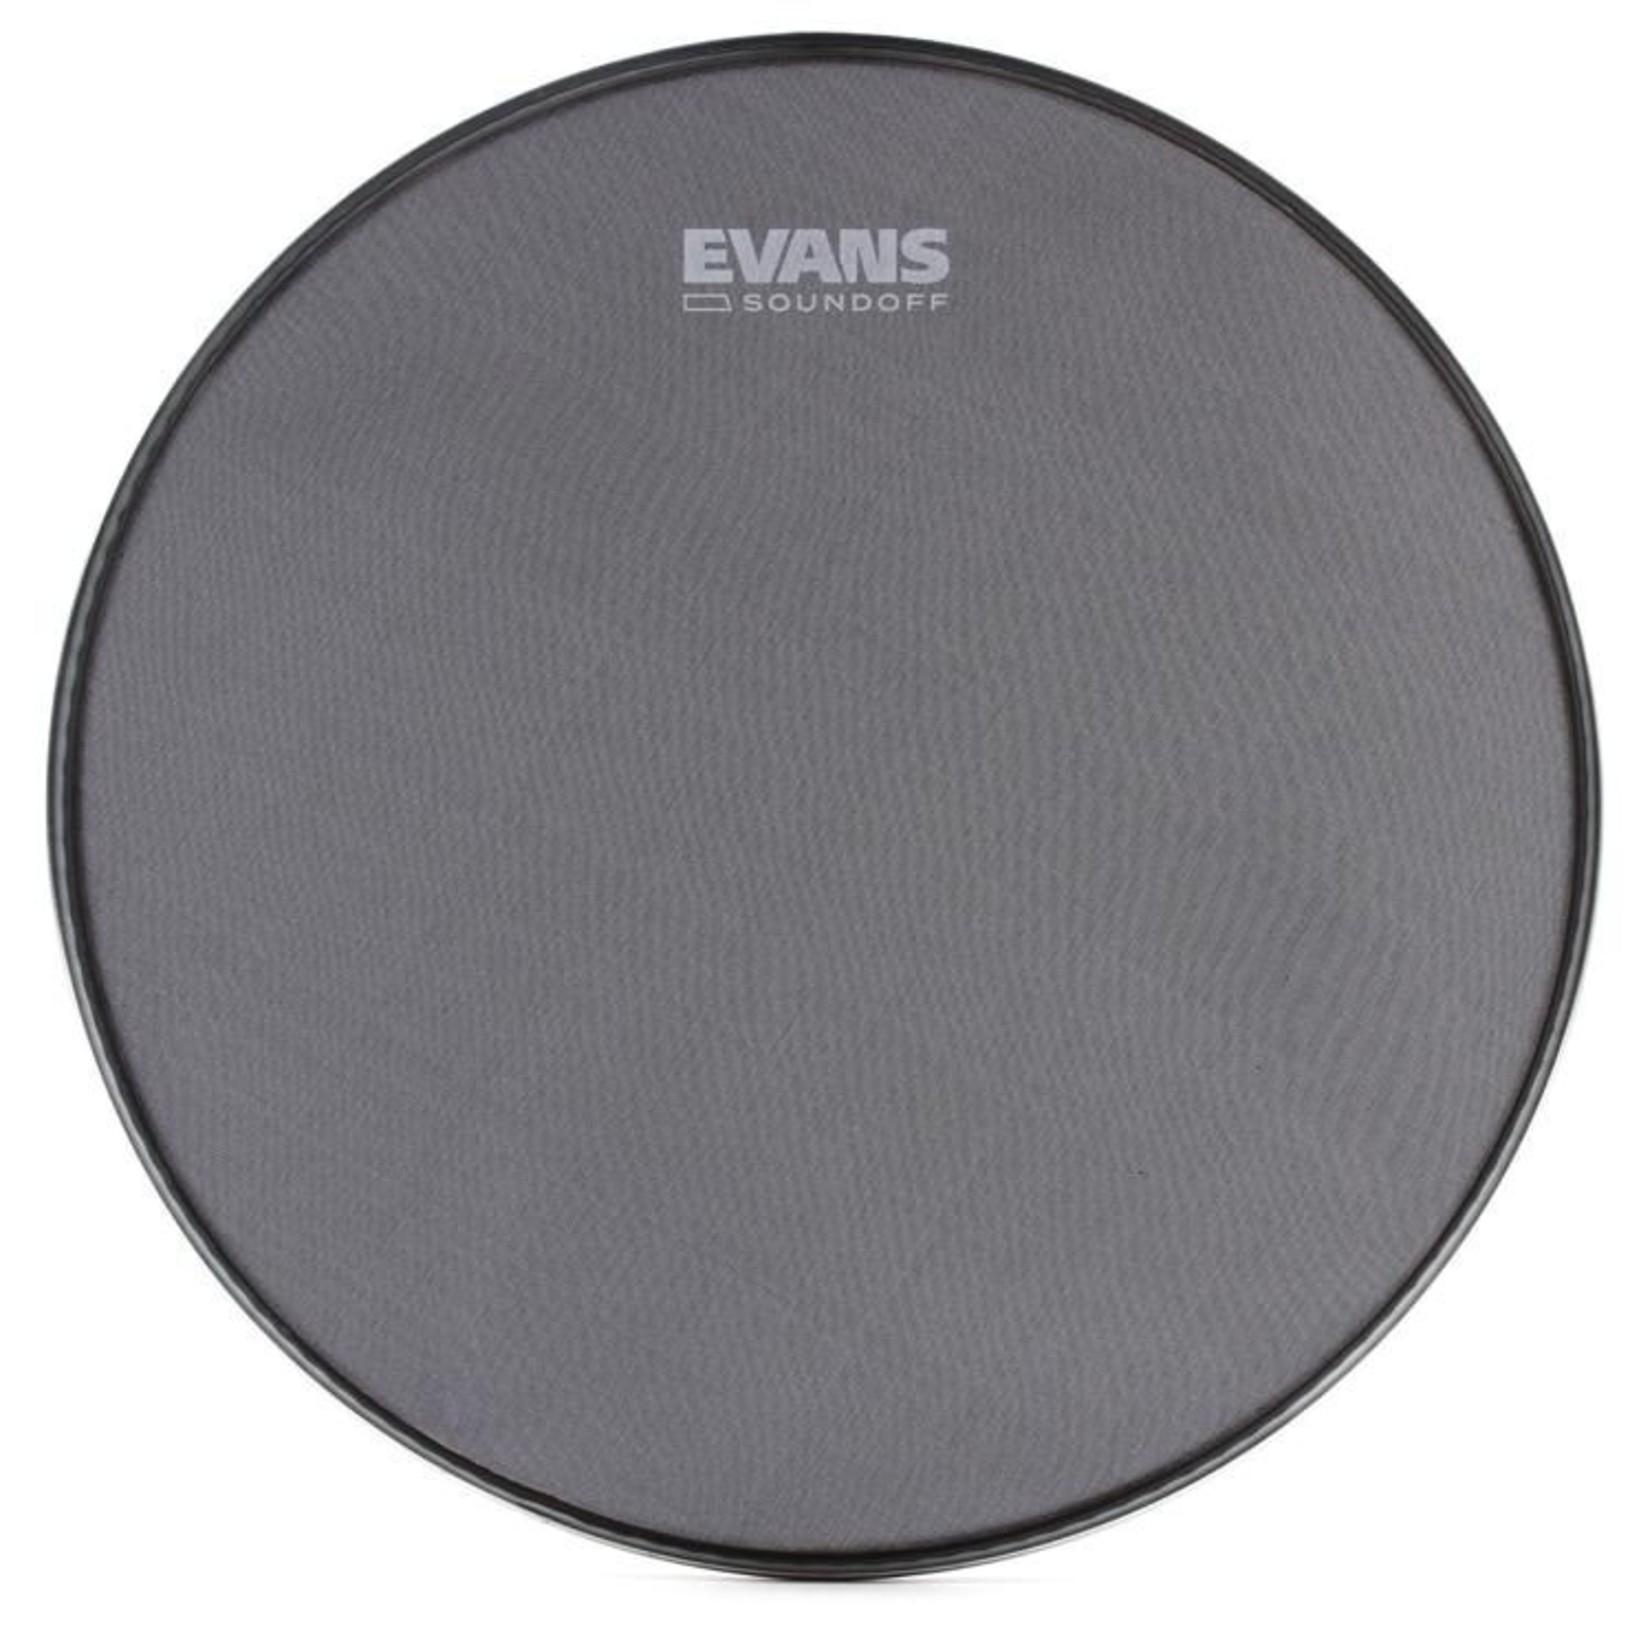 Evans Evans Soundoff Tom/Snare Heads